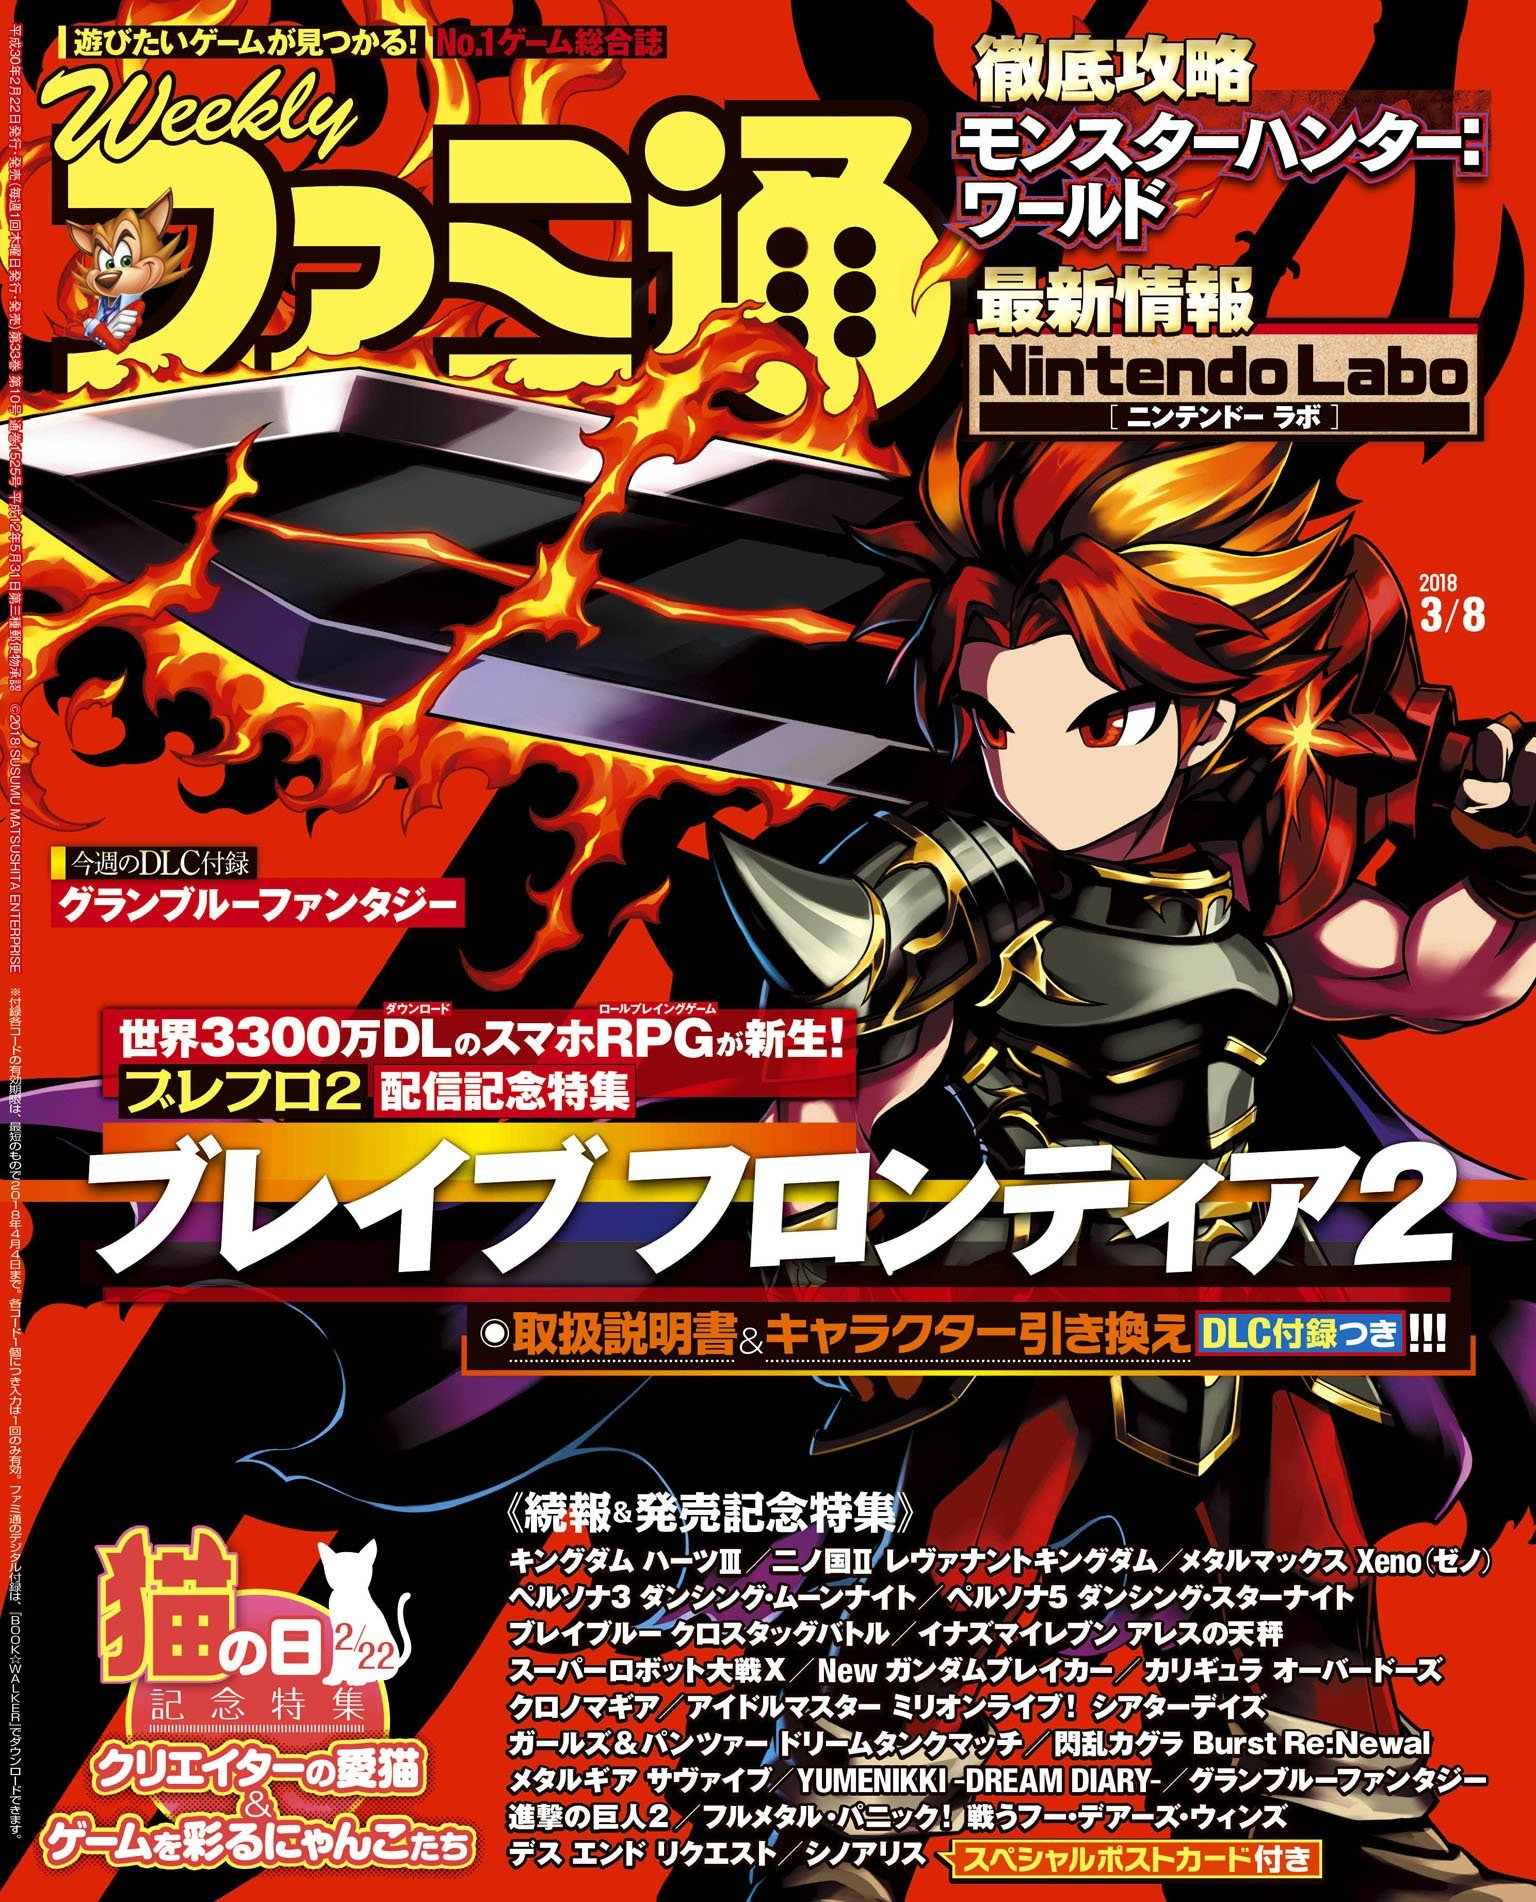 Famitsu 1525 (March 8, 2018)